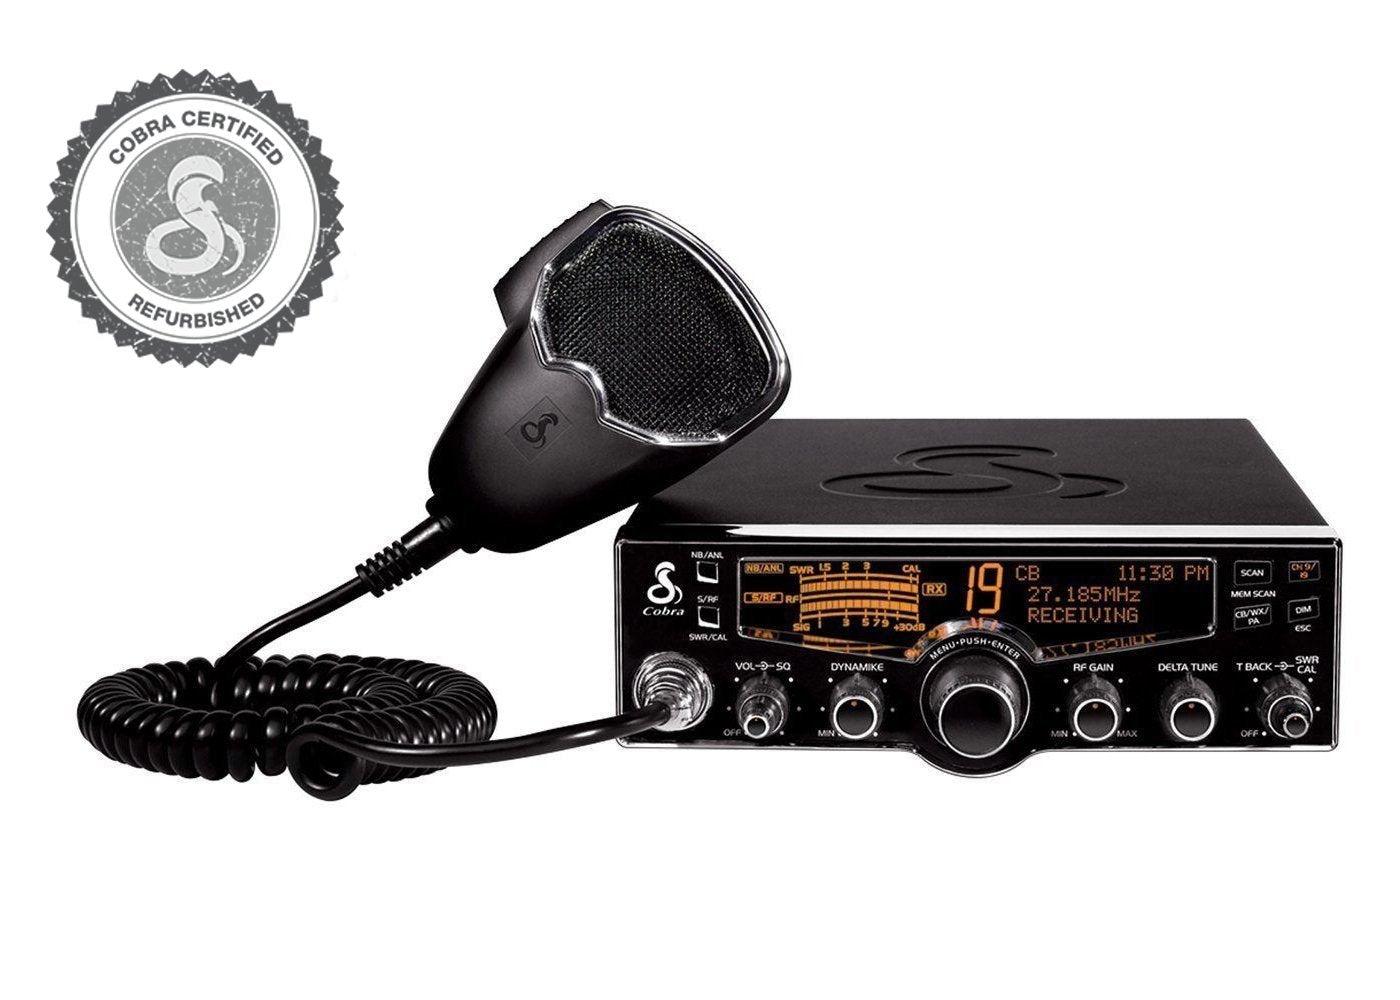 Cobra 29 LX (Refurb) Full Featured Professional CB Radio